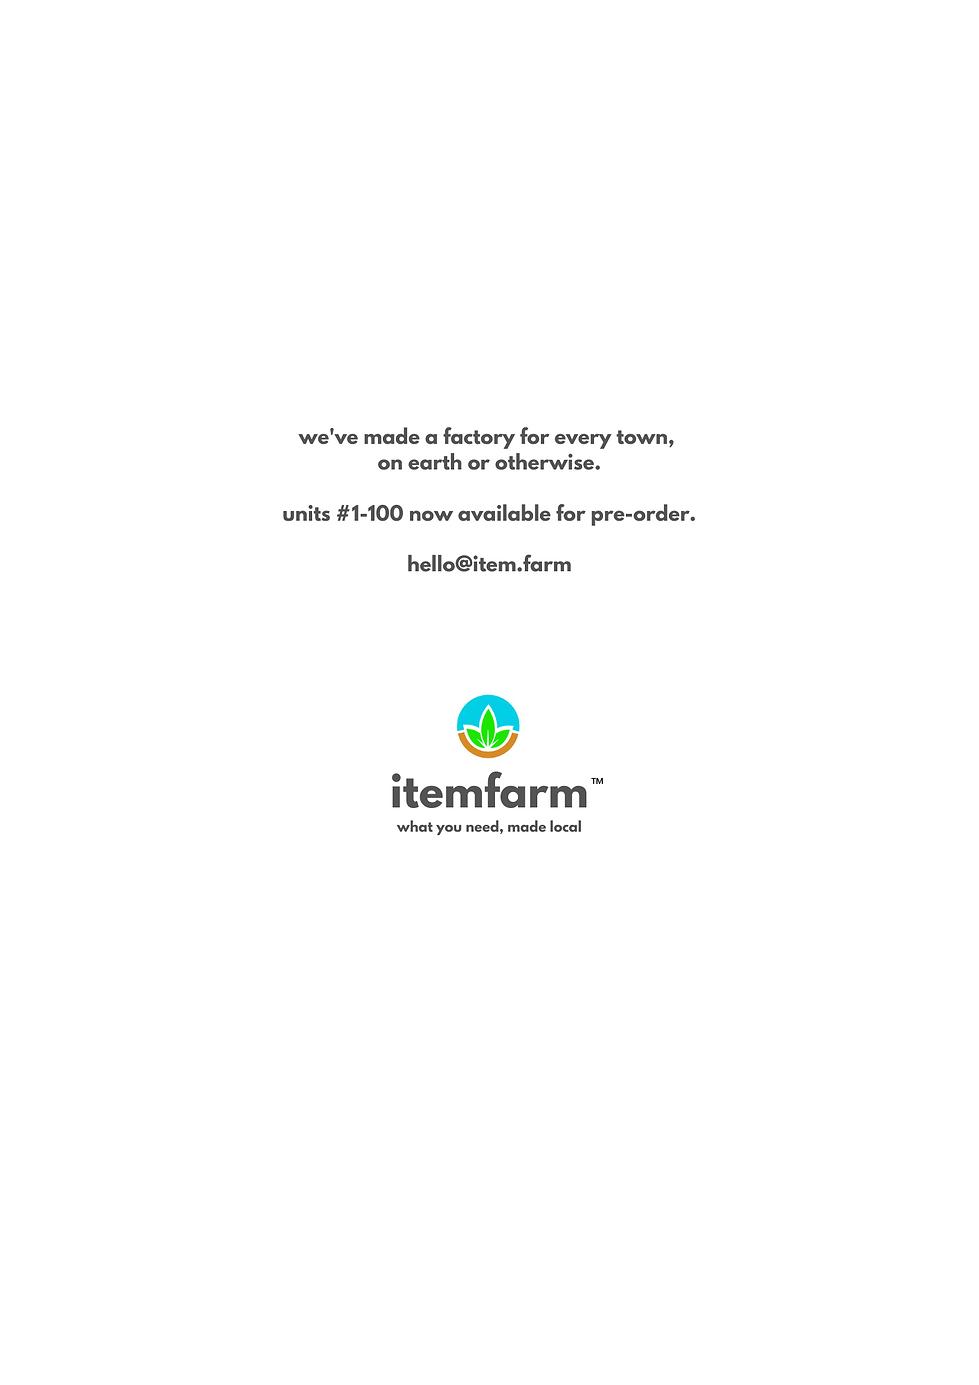 itemfarm Machine Datasheet (6).png